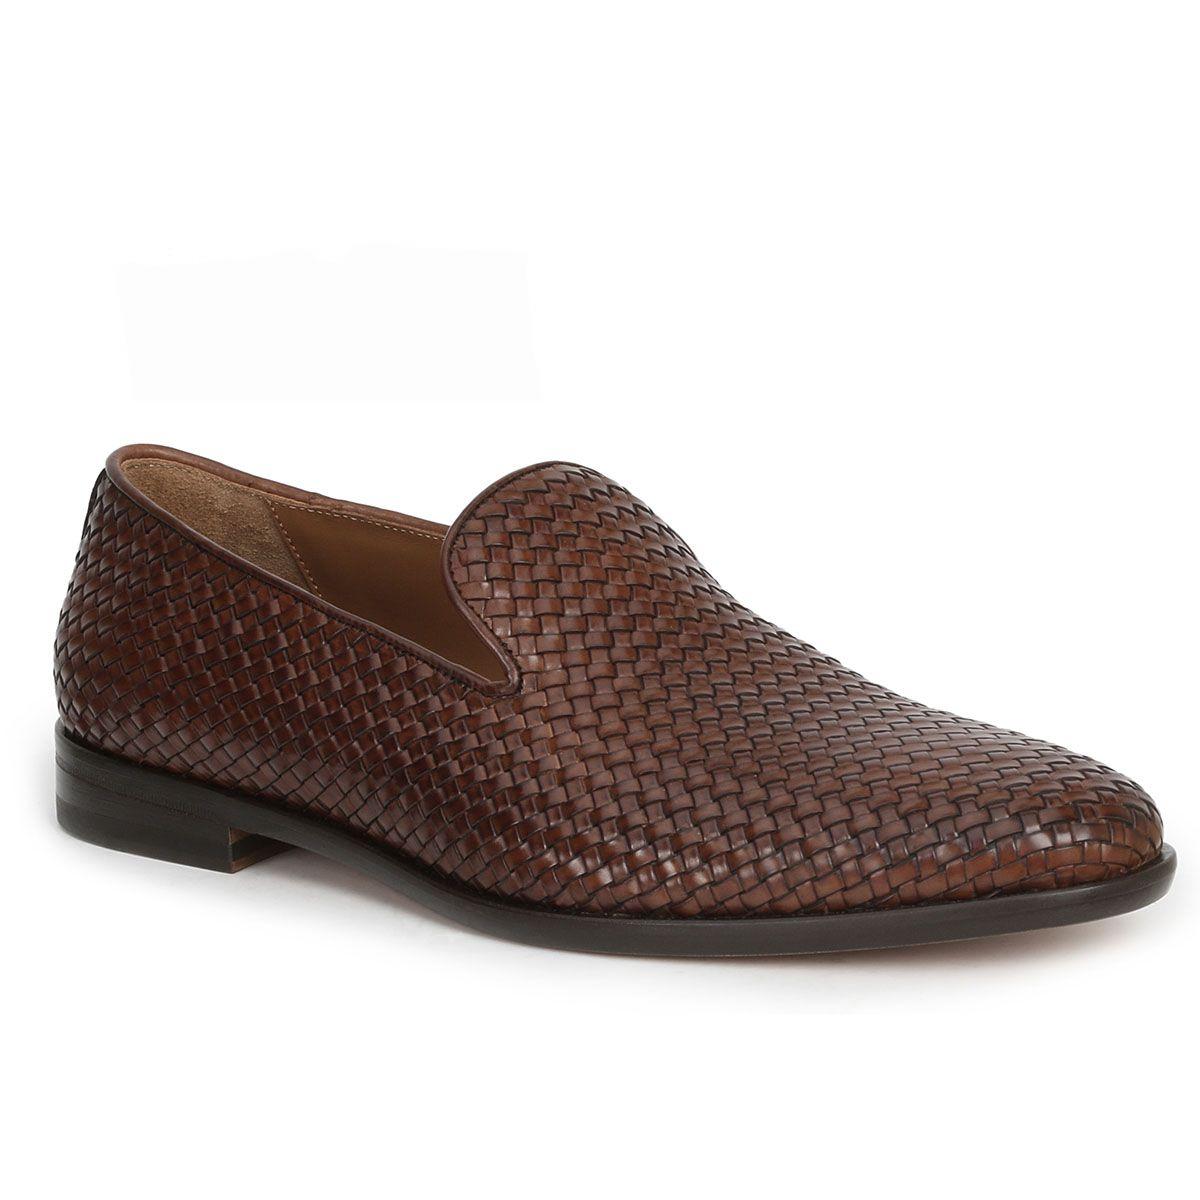 7e3e546d4d3 Bruno Magli Picasso Mens Shoes Cognac Woven Calfskin Loafers (BMS1002)